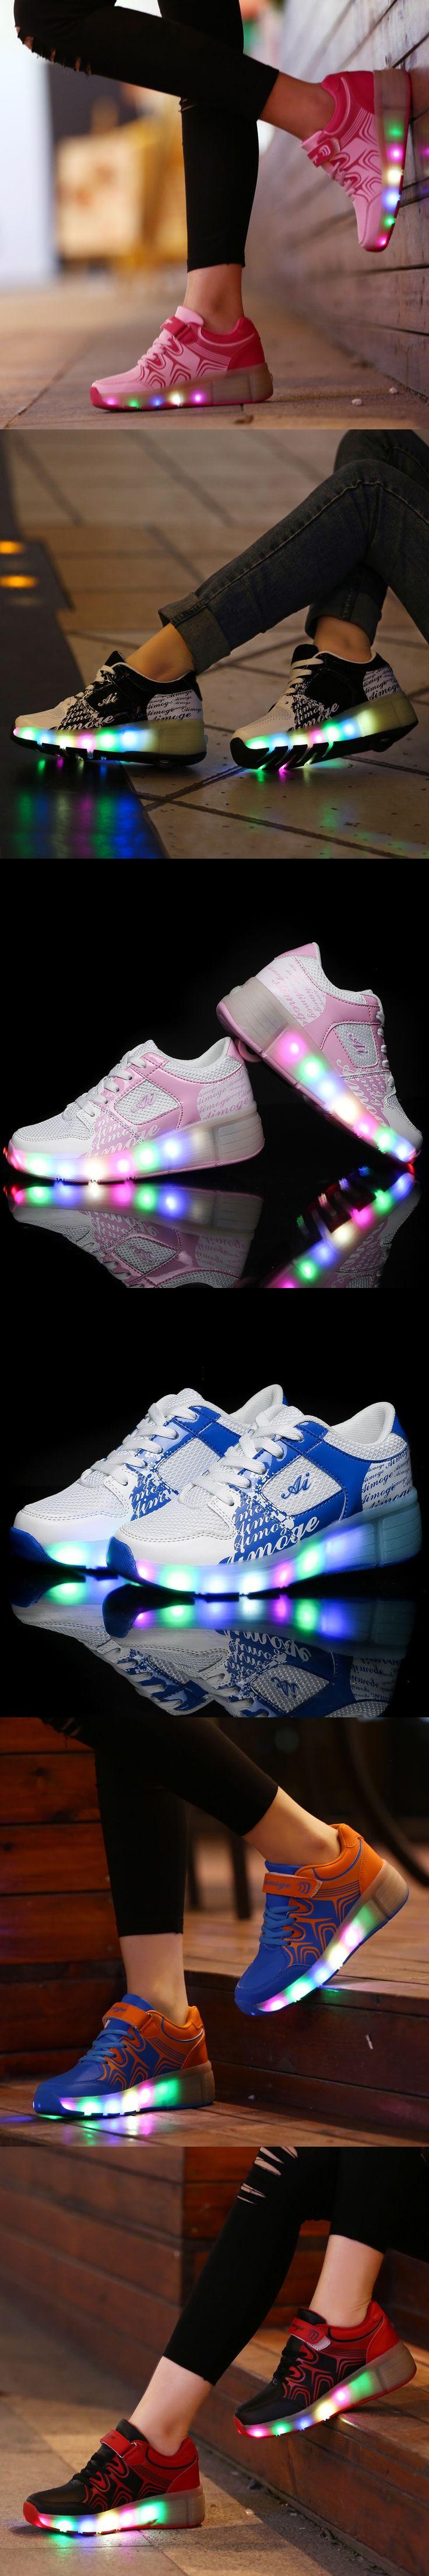 Roller shoes perth - 2016children Heelys Wheels Shoes With Led Light New Brand Kids Roller Skate Sneakers Boys Girls Luminous